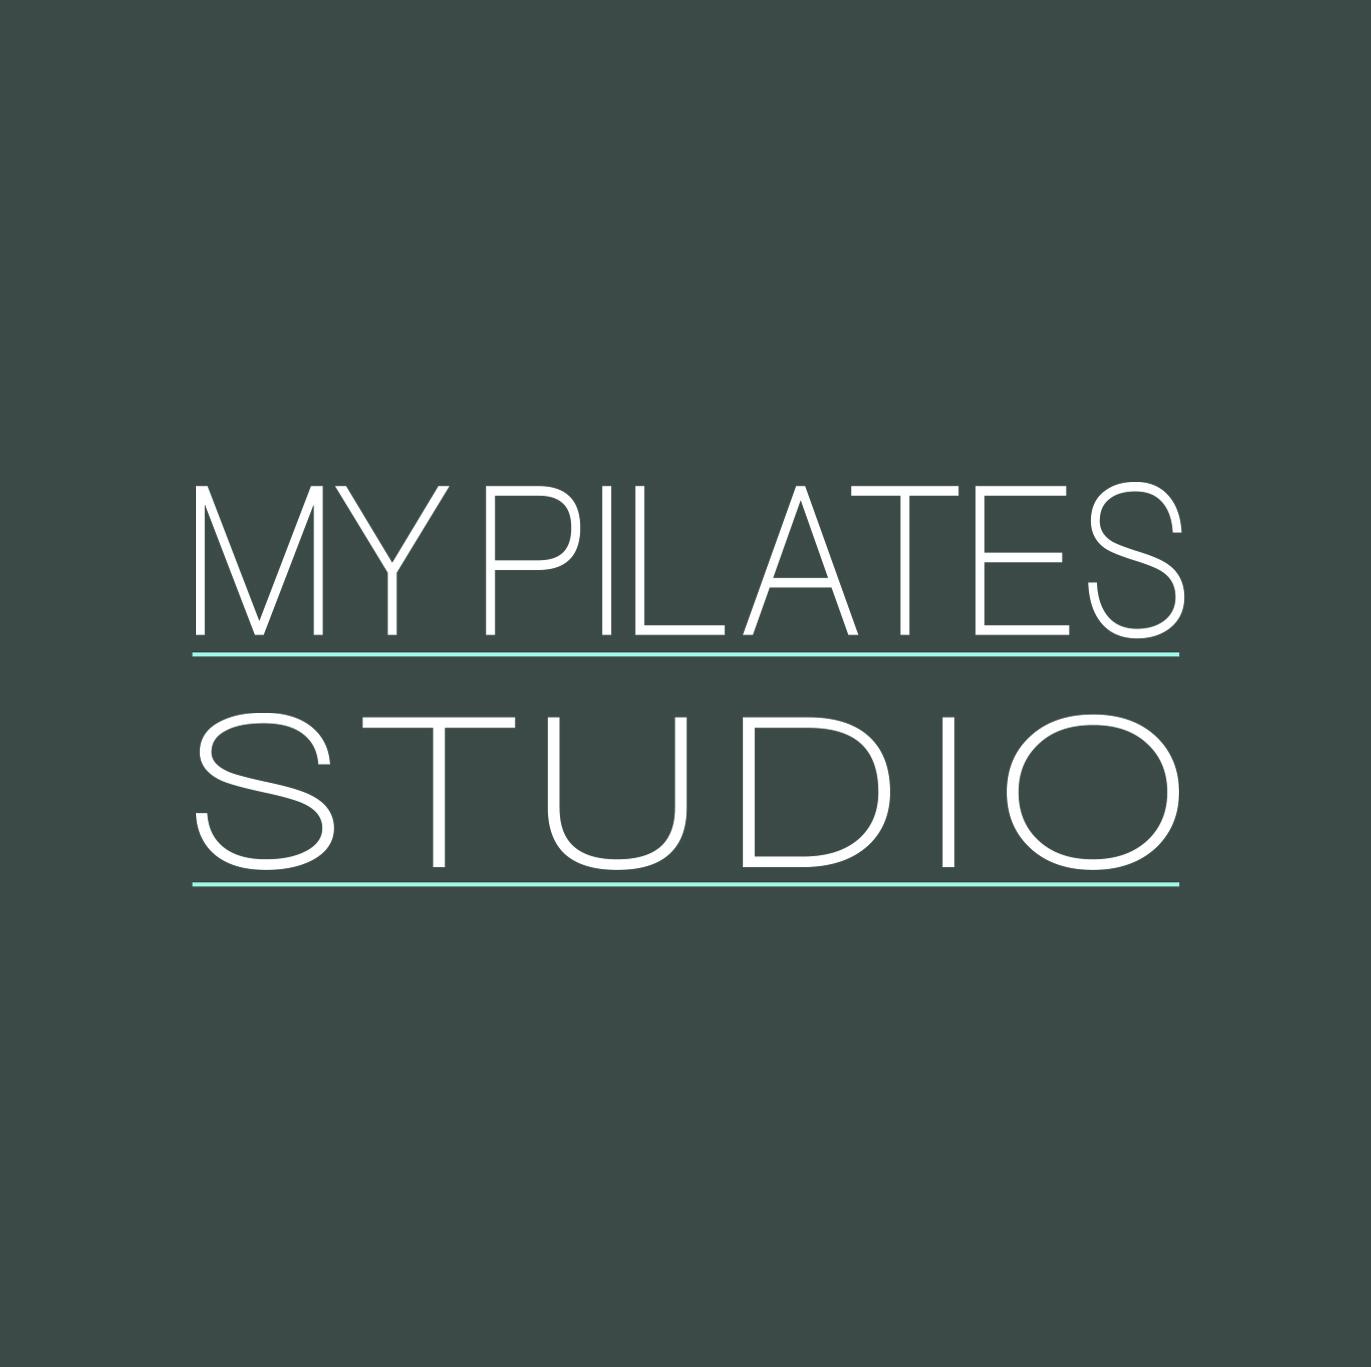 My Pilates Studyo